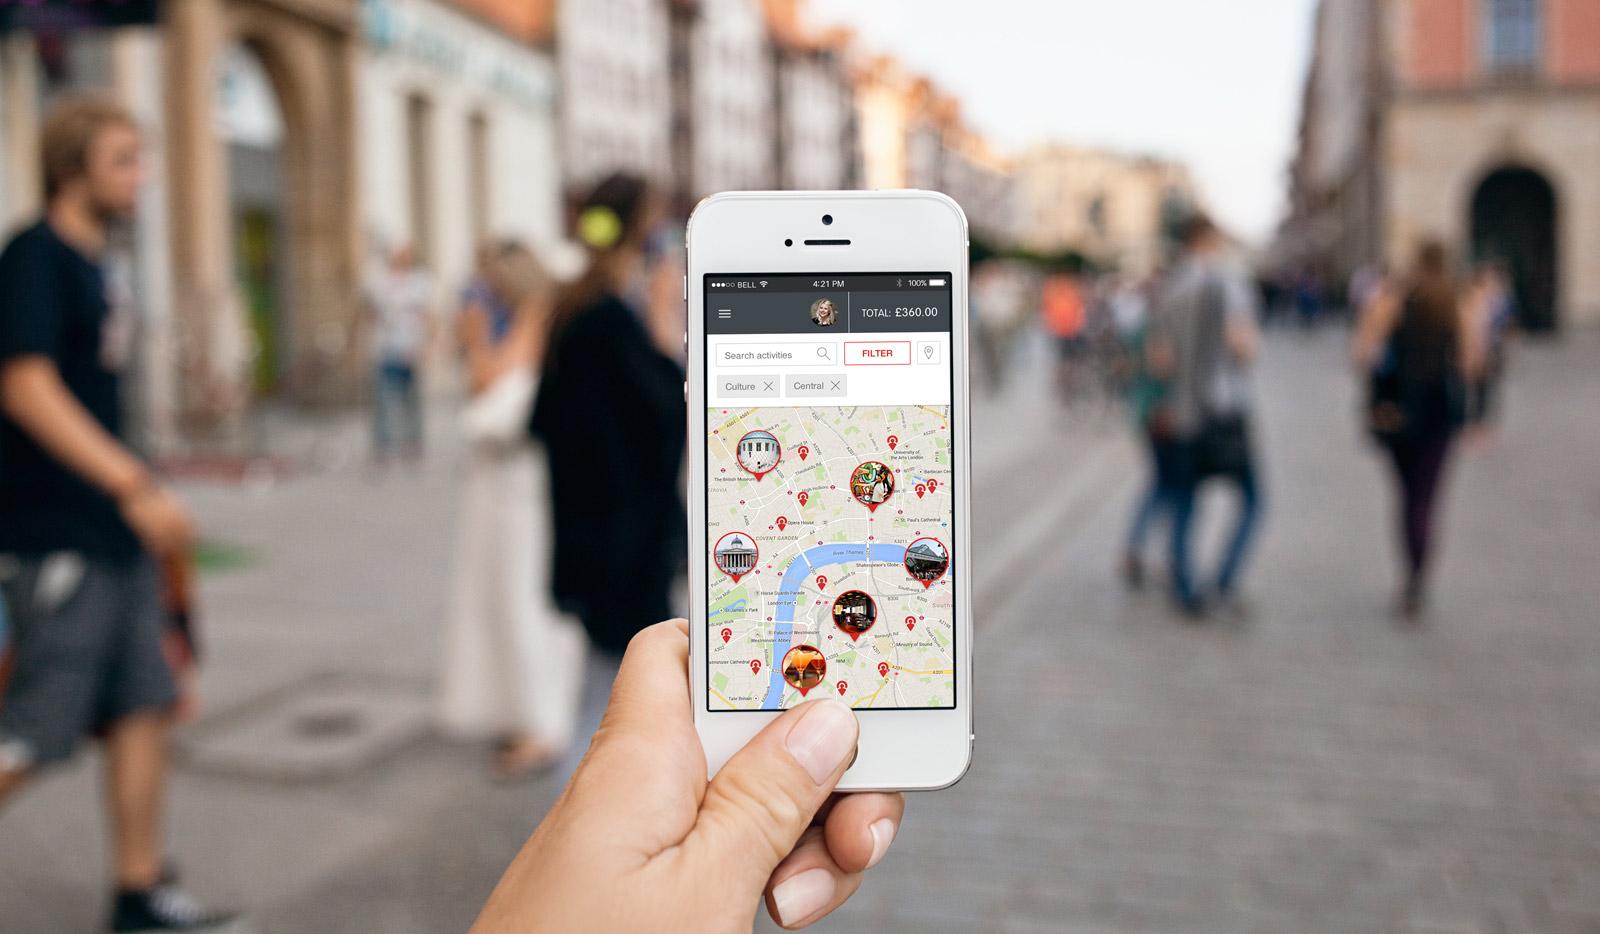 TripConsul website itinerary builder map screen UI design and development on mobile